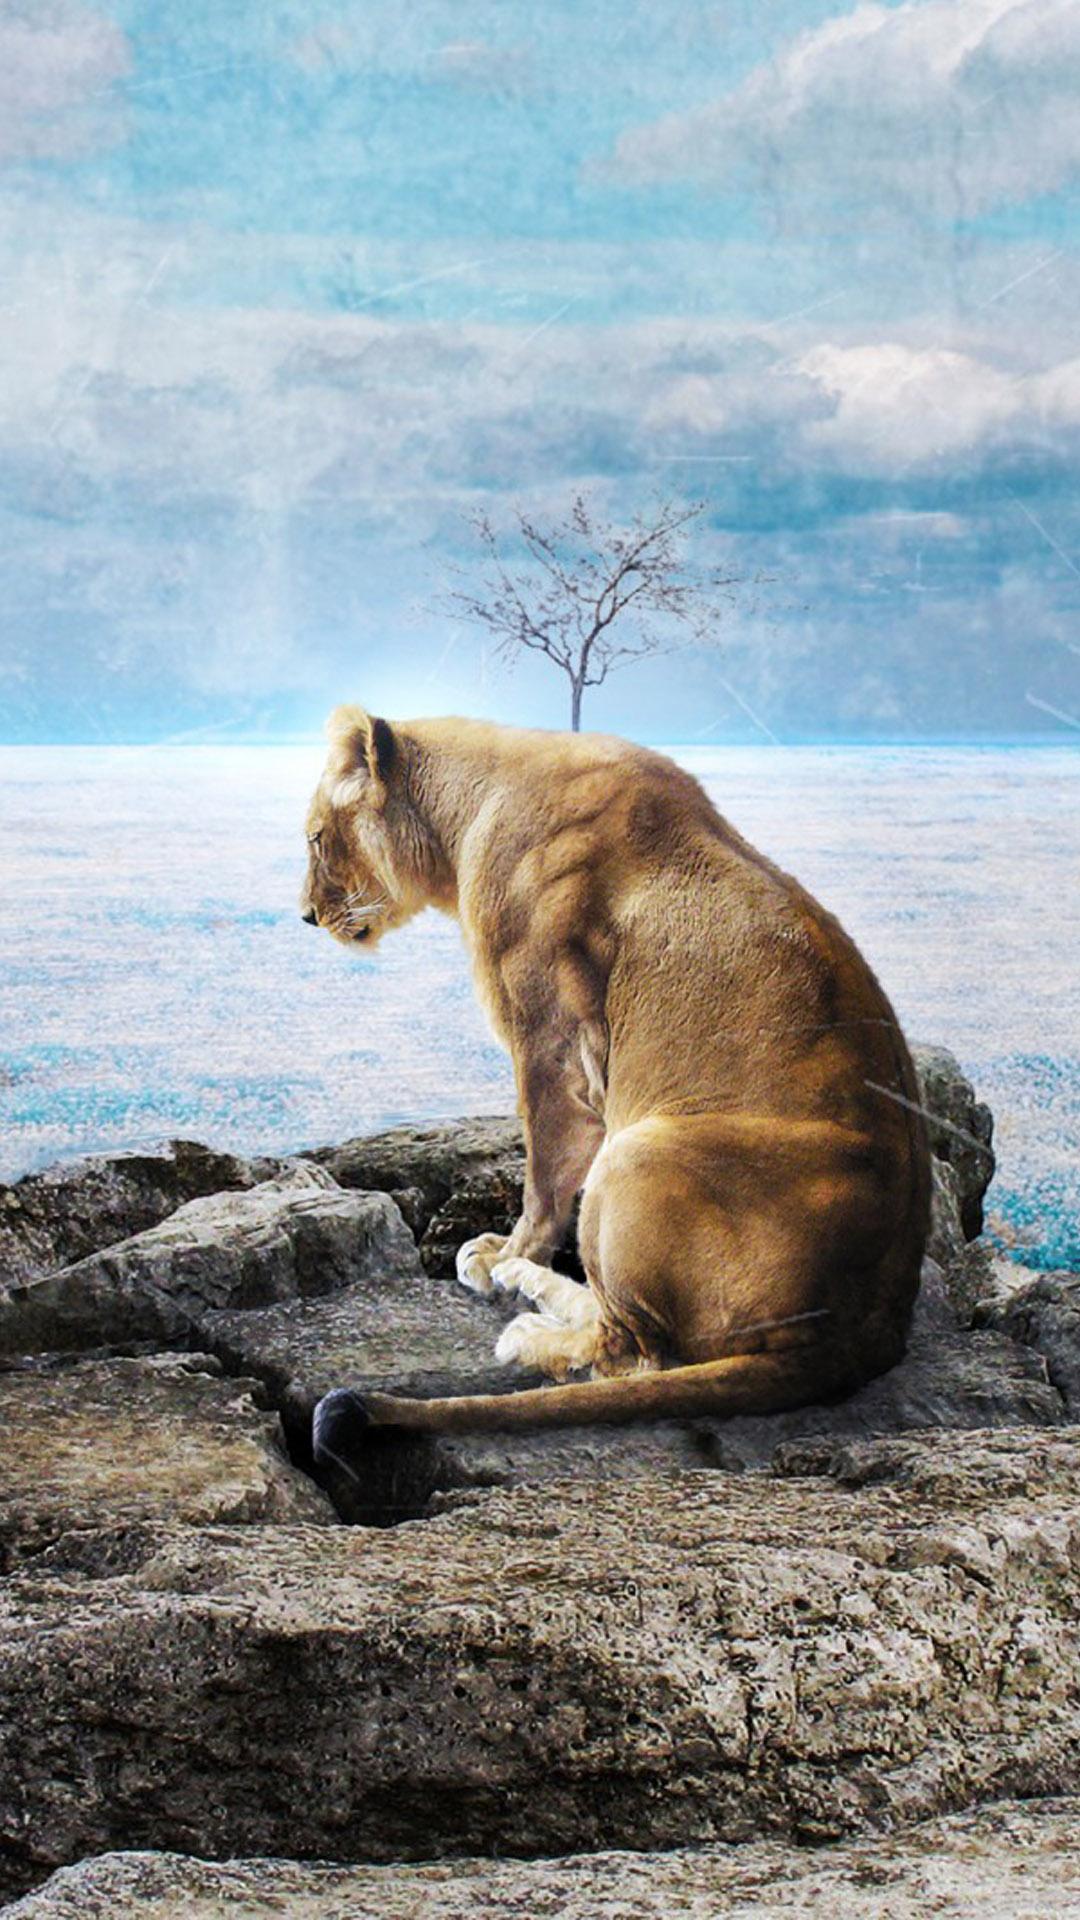 Download Lone Sad Lion Free Pure 4k Ultra Hd Mobile Wallpaper